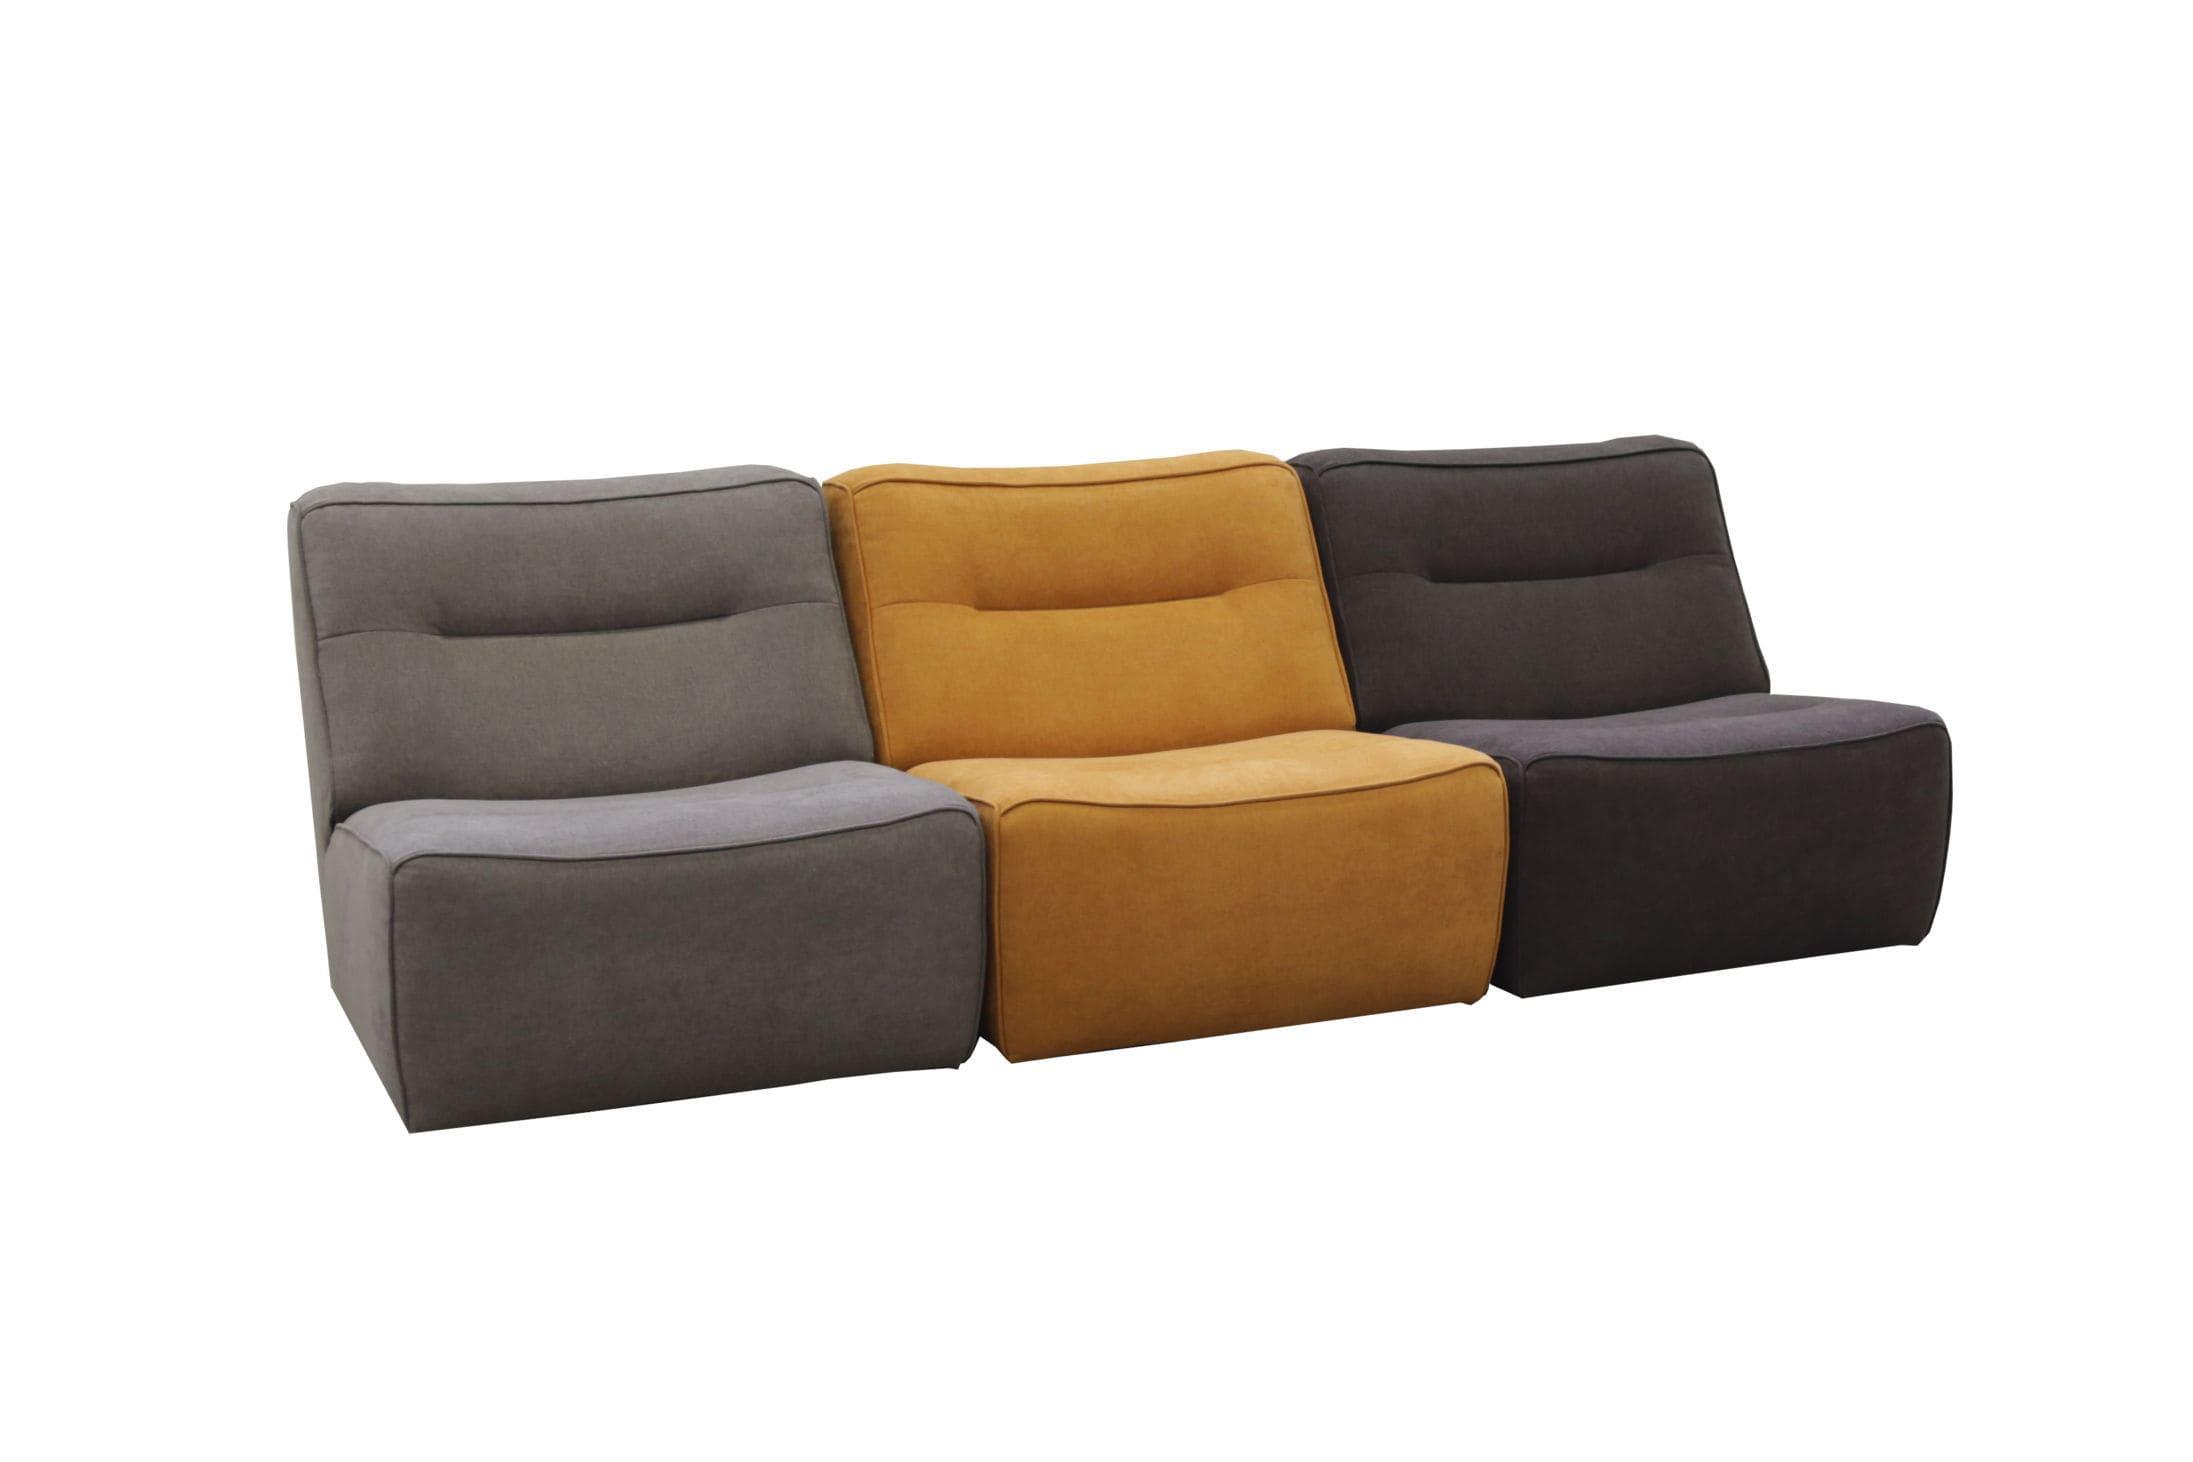 Modular sofa contemporary leather fabric ARENA Luonto